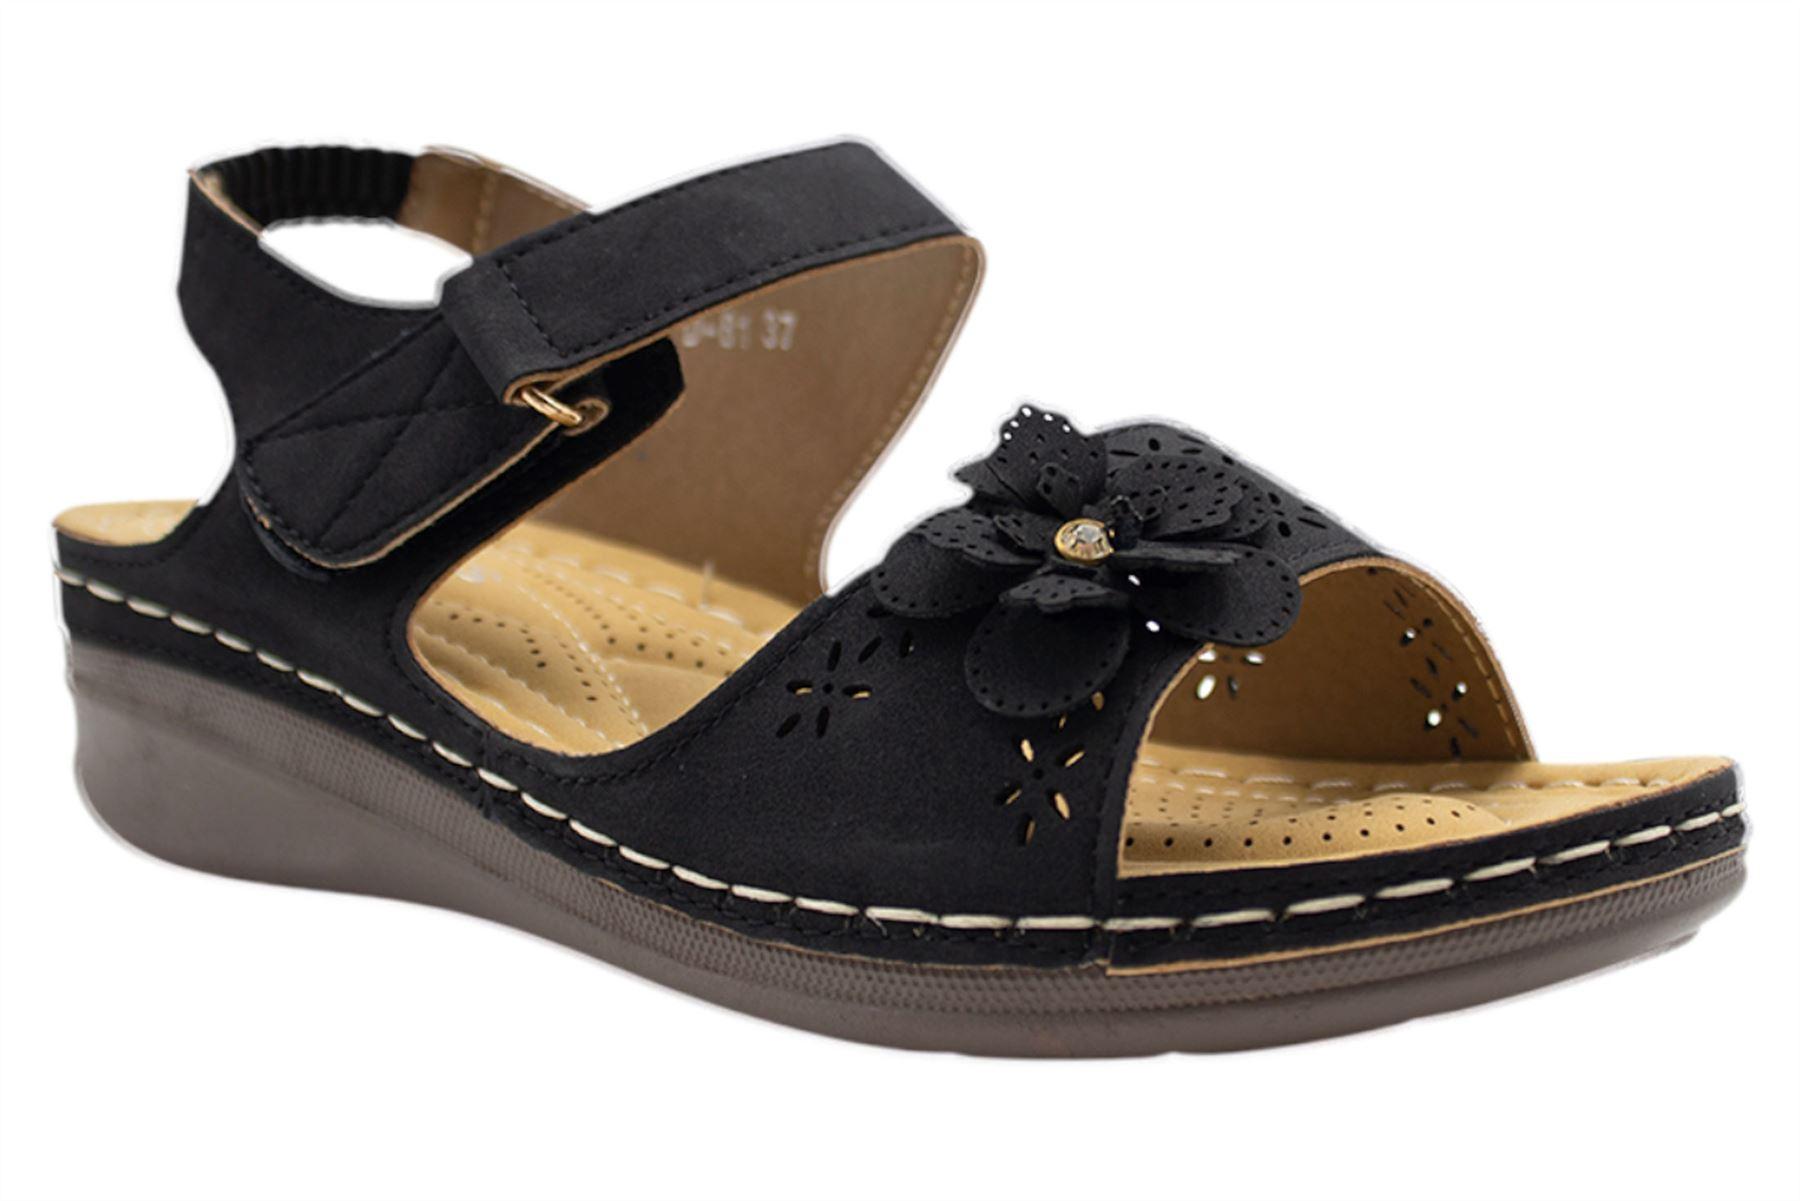 Ladies-Sandals-Womens-Mid-Heel-Comfort-Summer-Beach-Casual-Wear miniatura 12